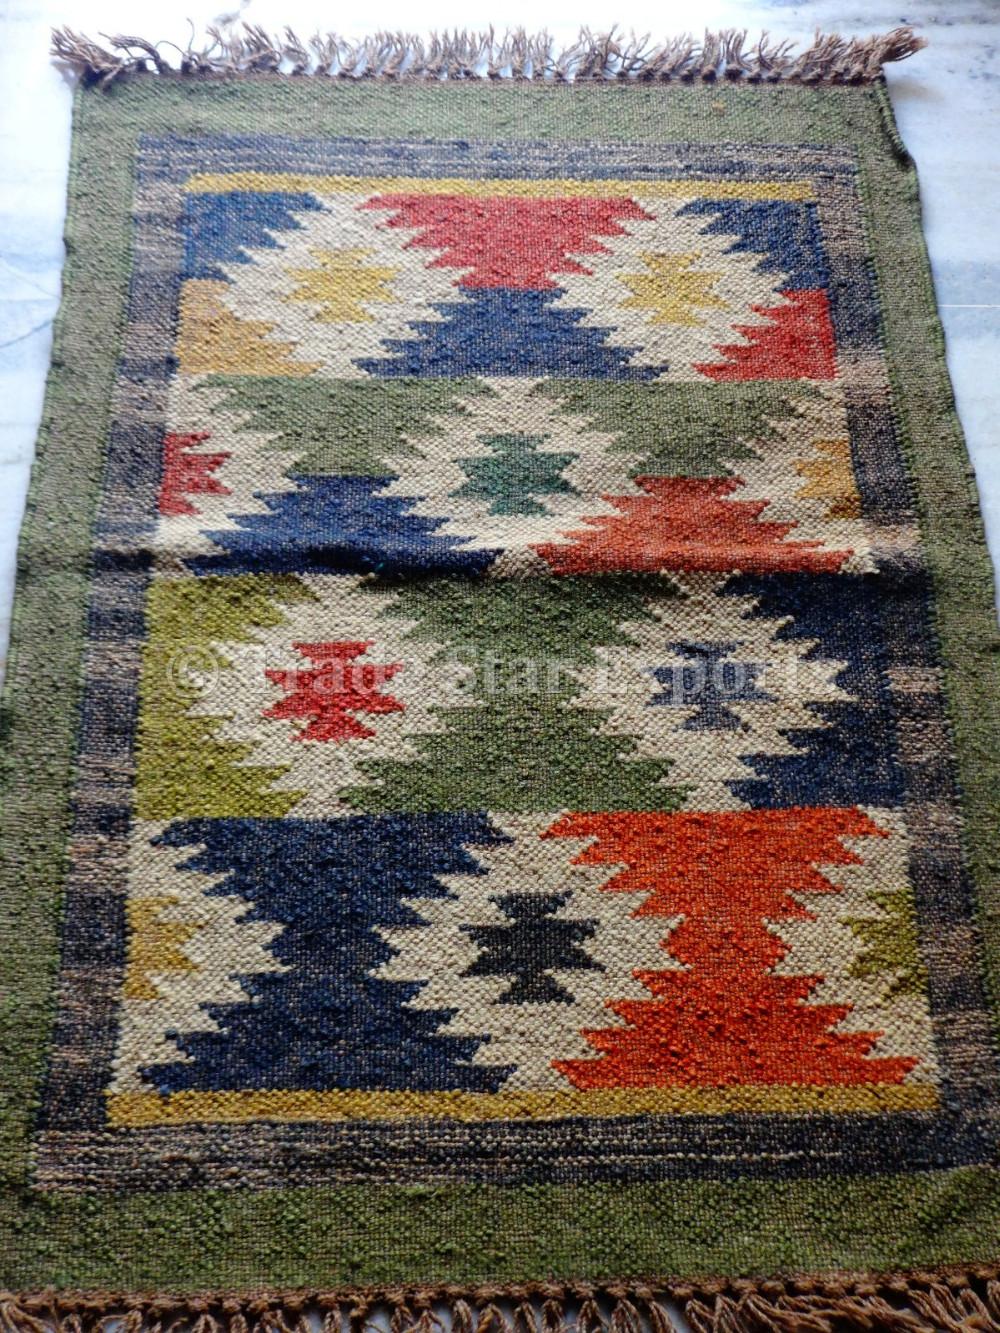 Indian Jute Kilim Rug 2X3 Ethnic Hand Loomed Carpet Rug Runner Area Throw Rugs